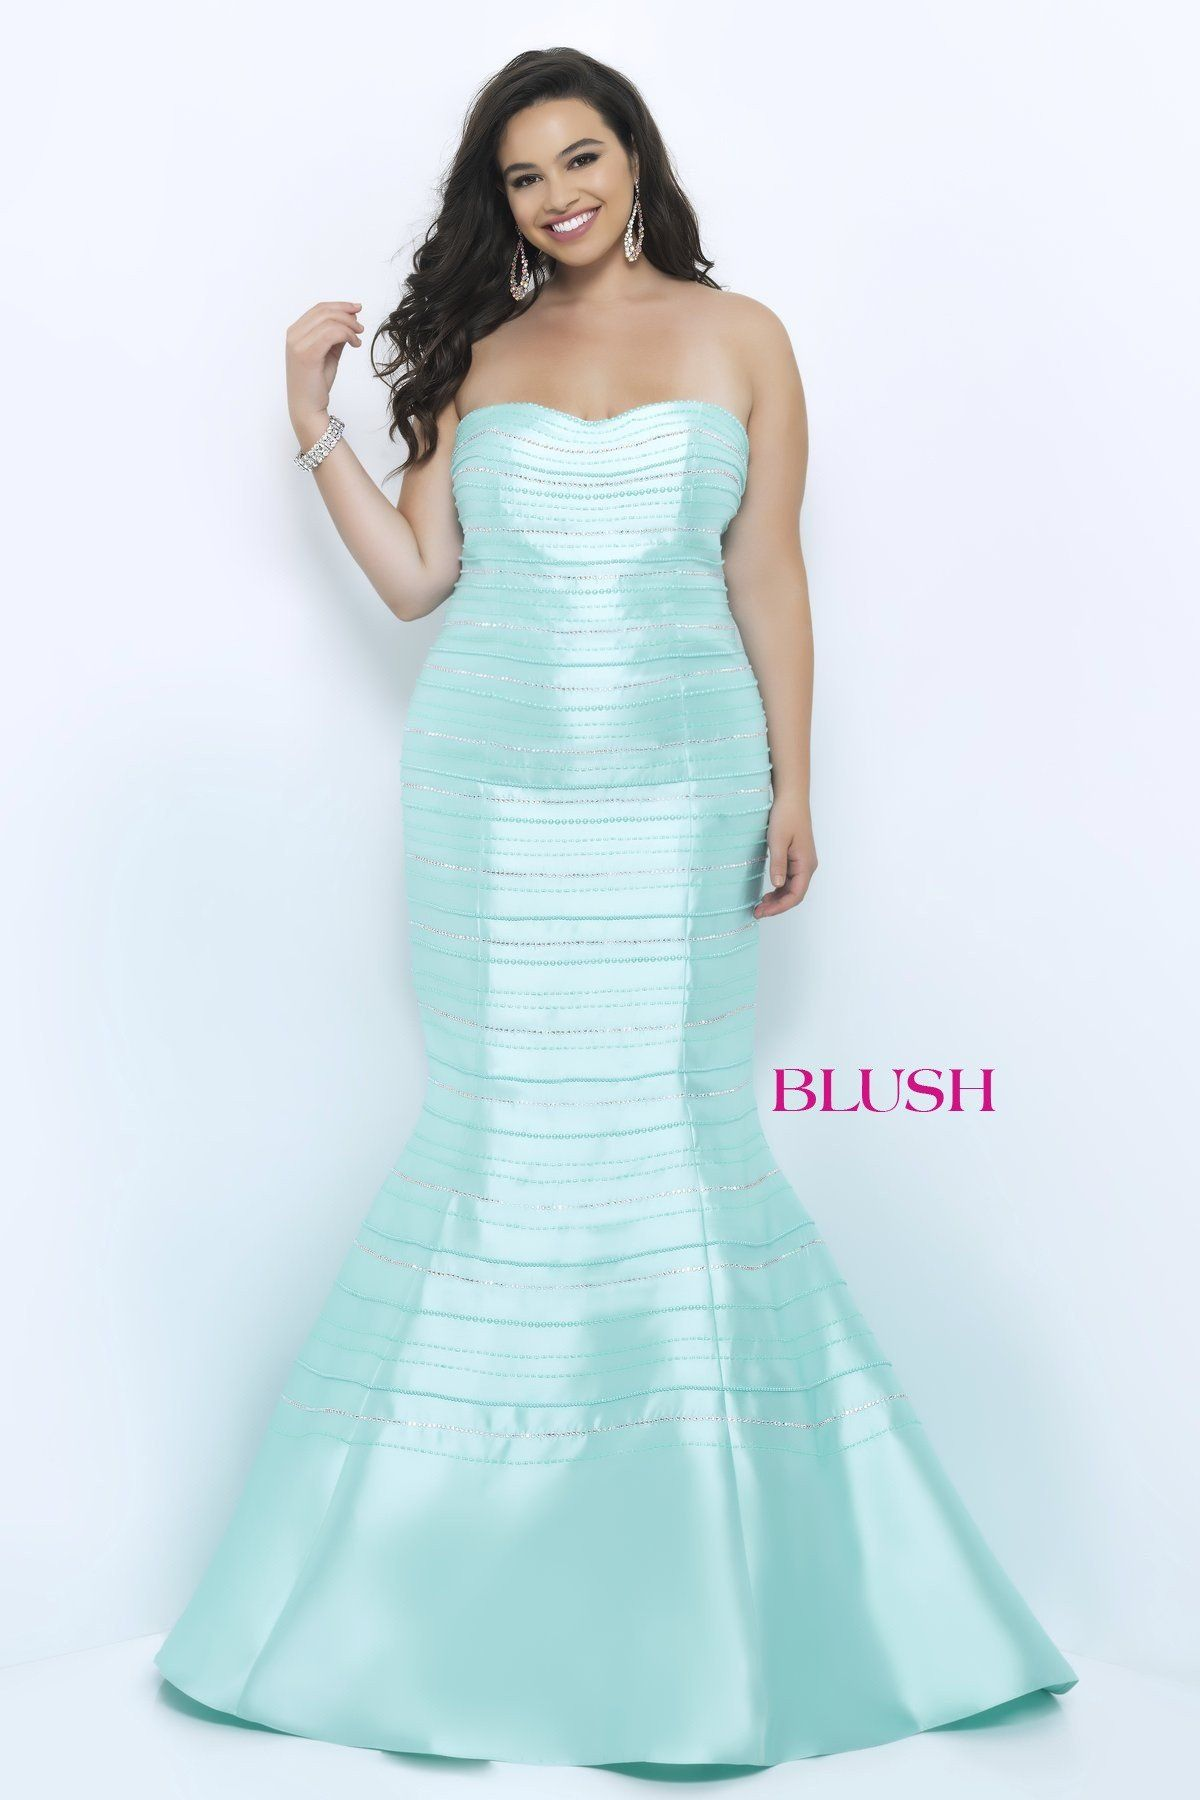 Charming Blush Short Prom Dresses Ideas - Wedding Ideas ...